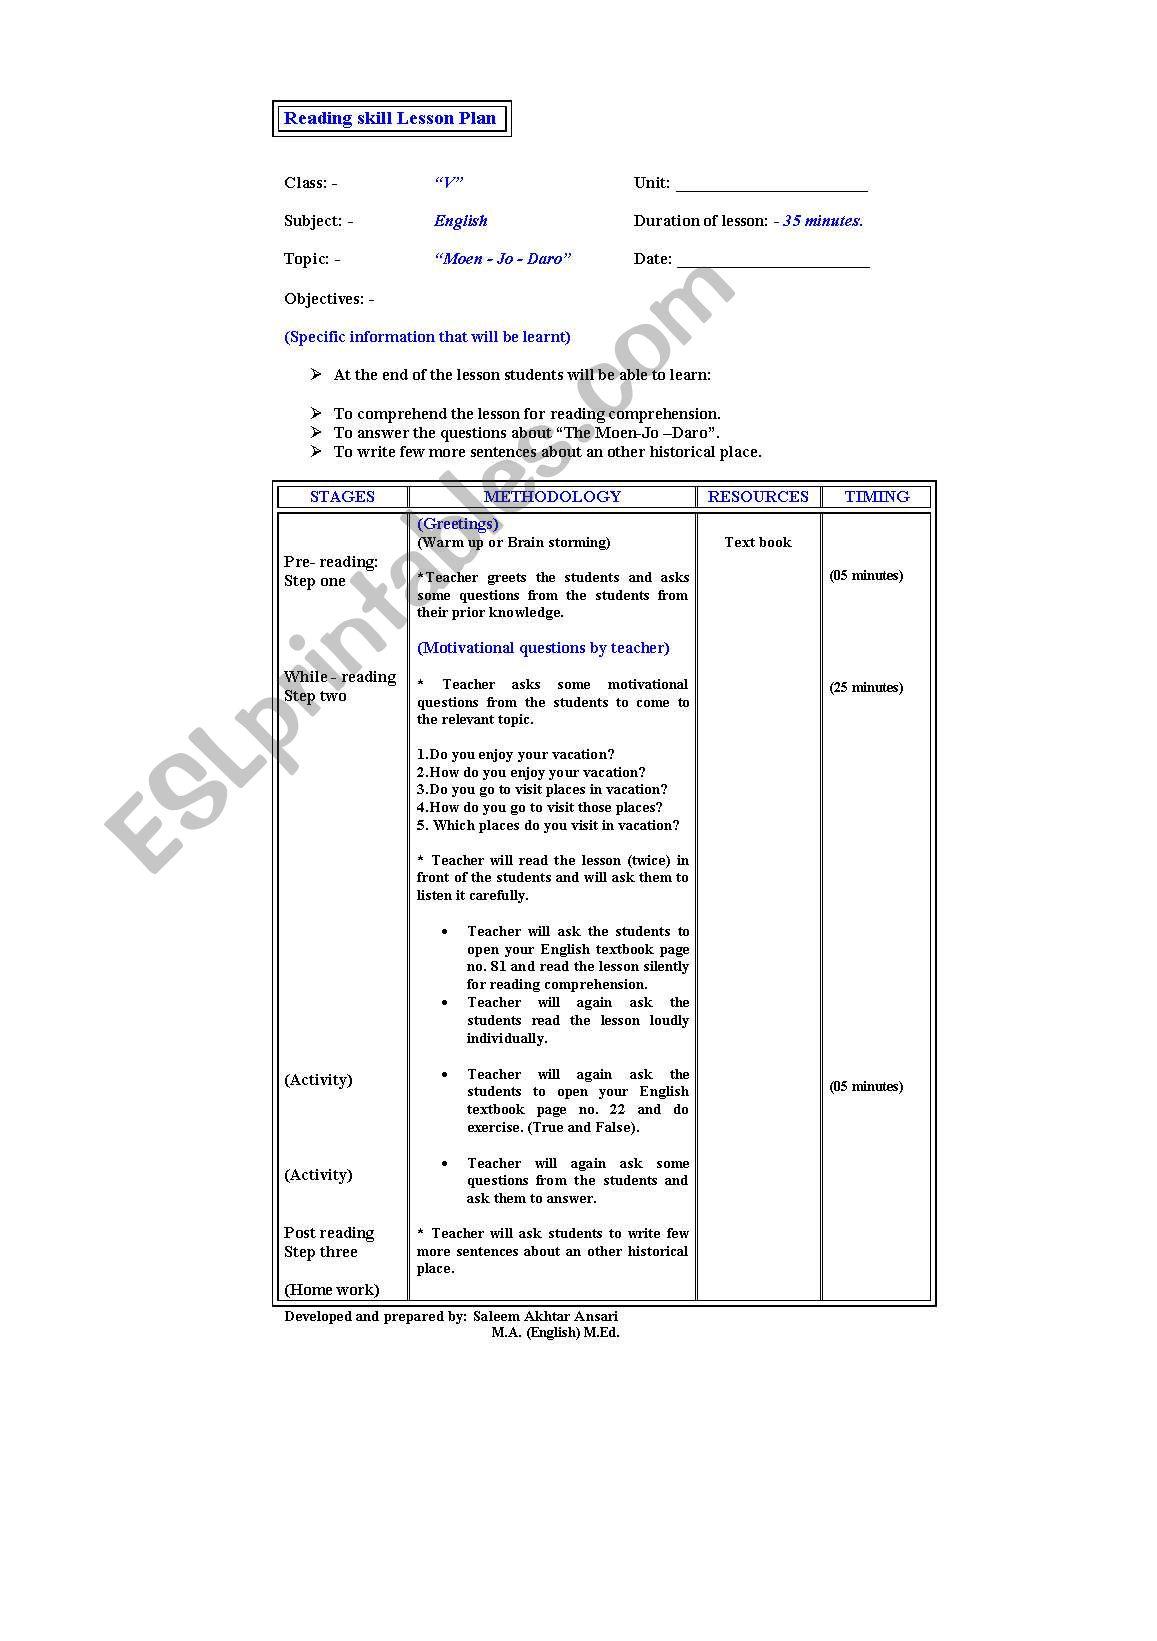 Lesson Plan for reading skill - ESL worksheet by sagar73